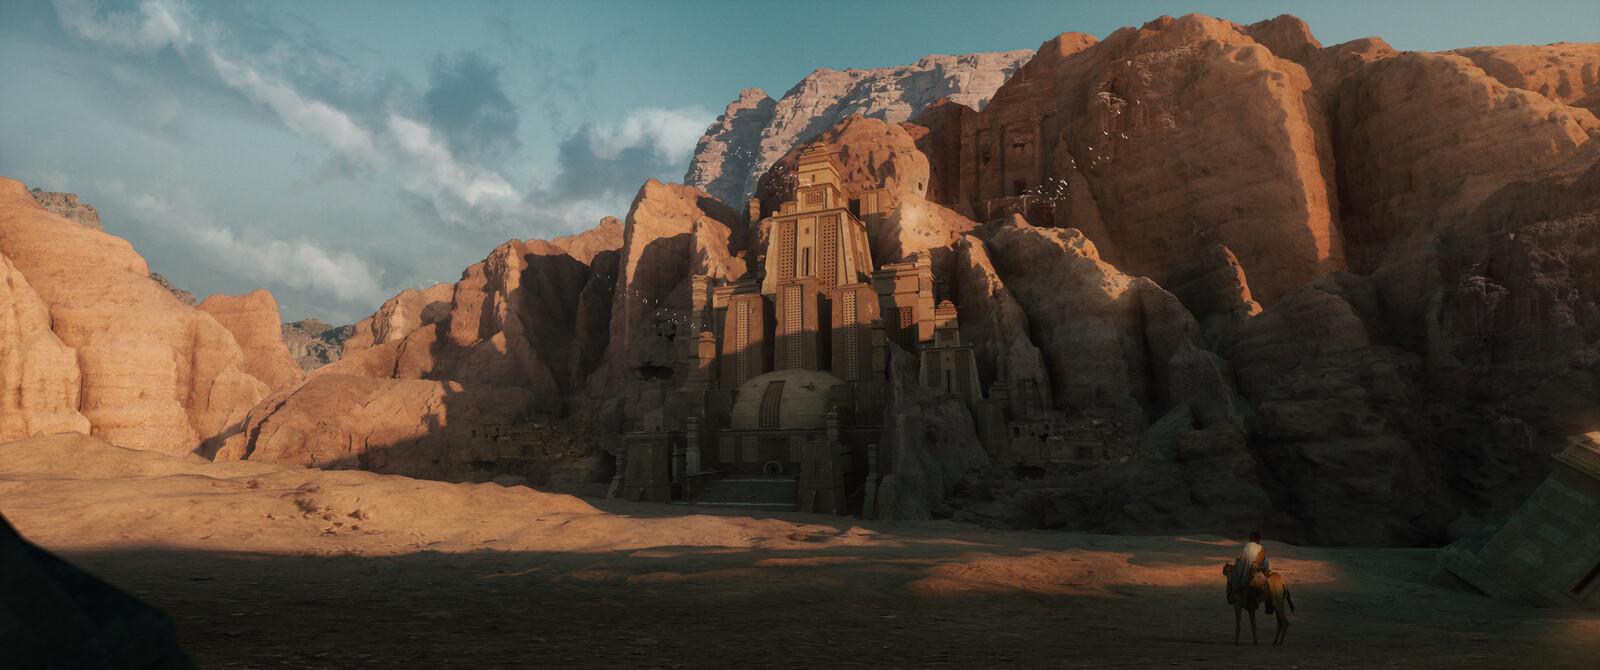 Ruins, Concept practice.